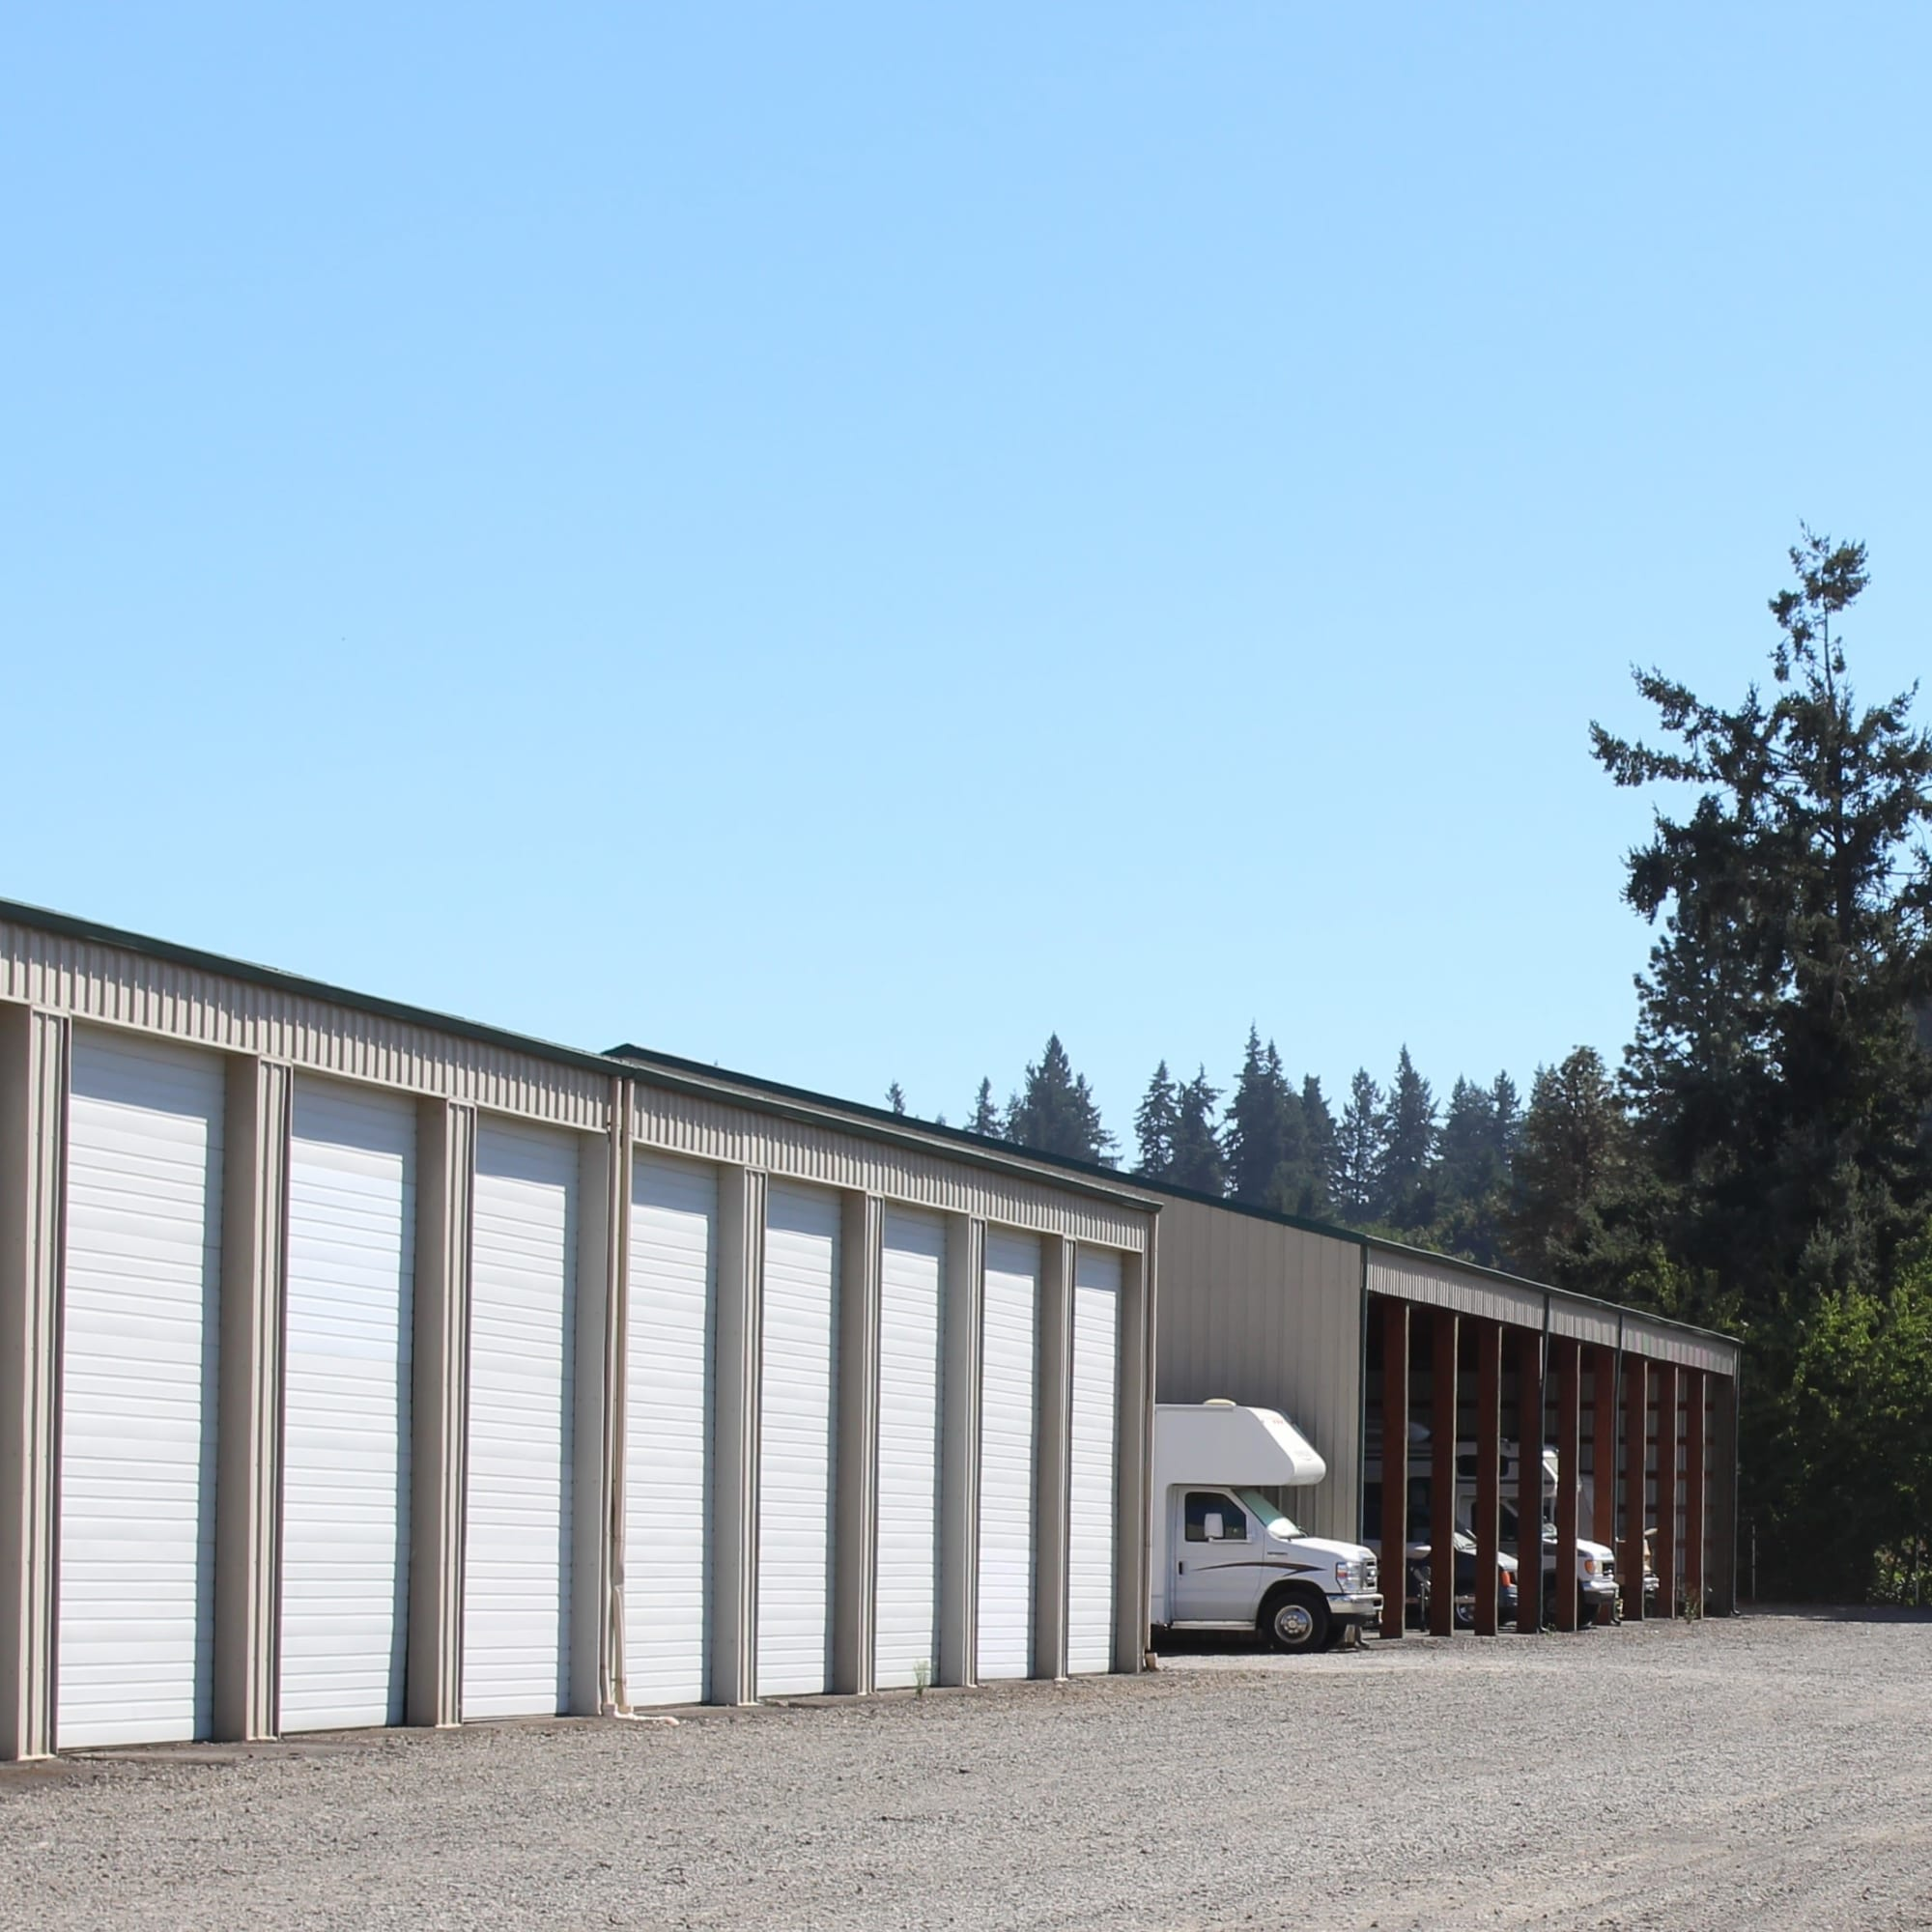 Covered RV storage at South Salem RV & Storage in Salem